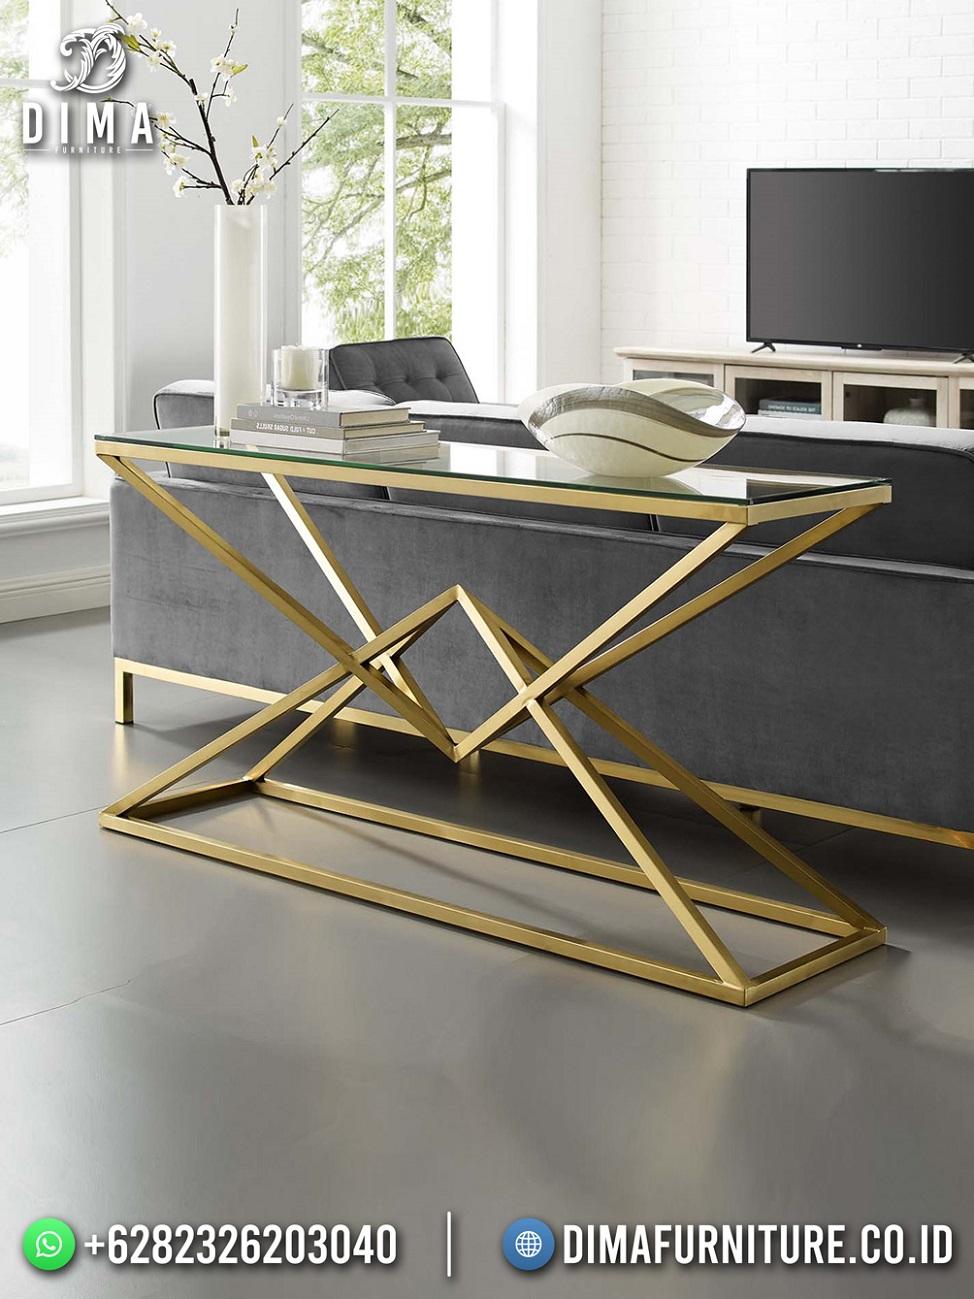 Meja Konsul Minimalis Modern Luxury Stainless Steel Golden Shine ST-1520